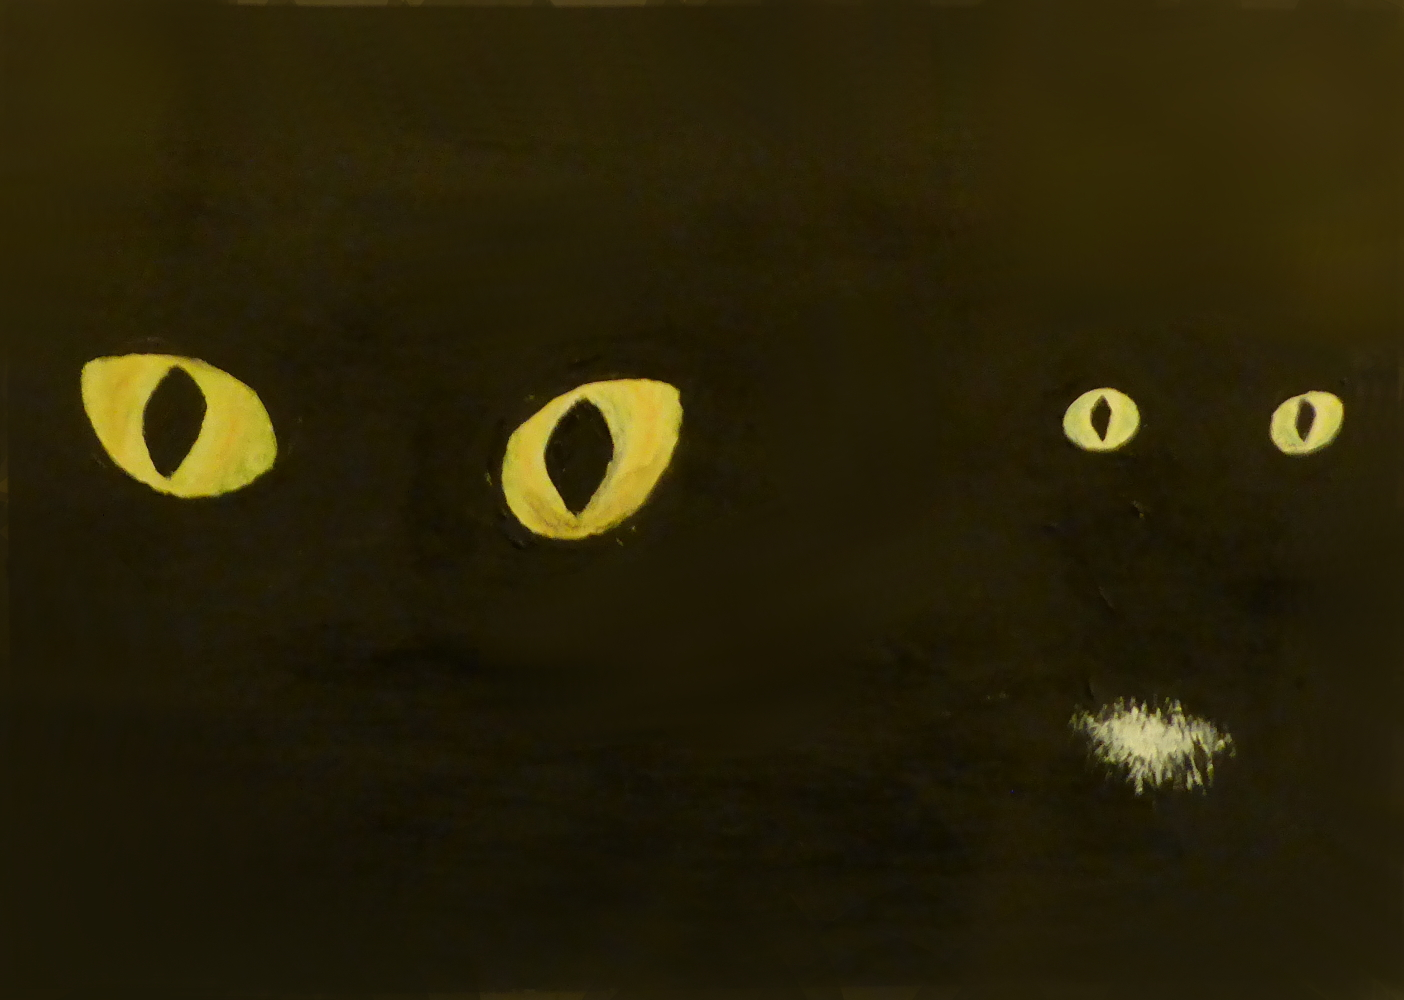 """A + G"", 2019, Acryl auf Pappe, 15 x 11 cm"